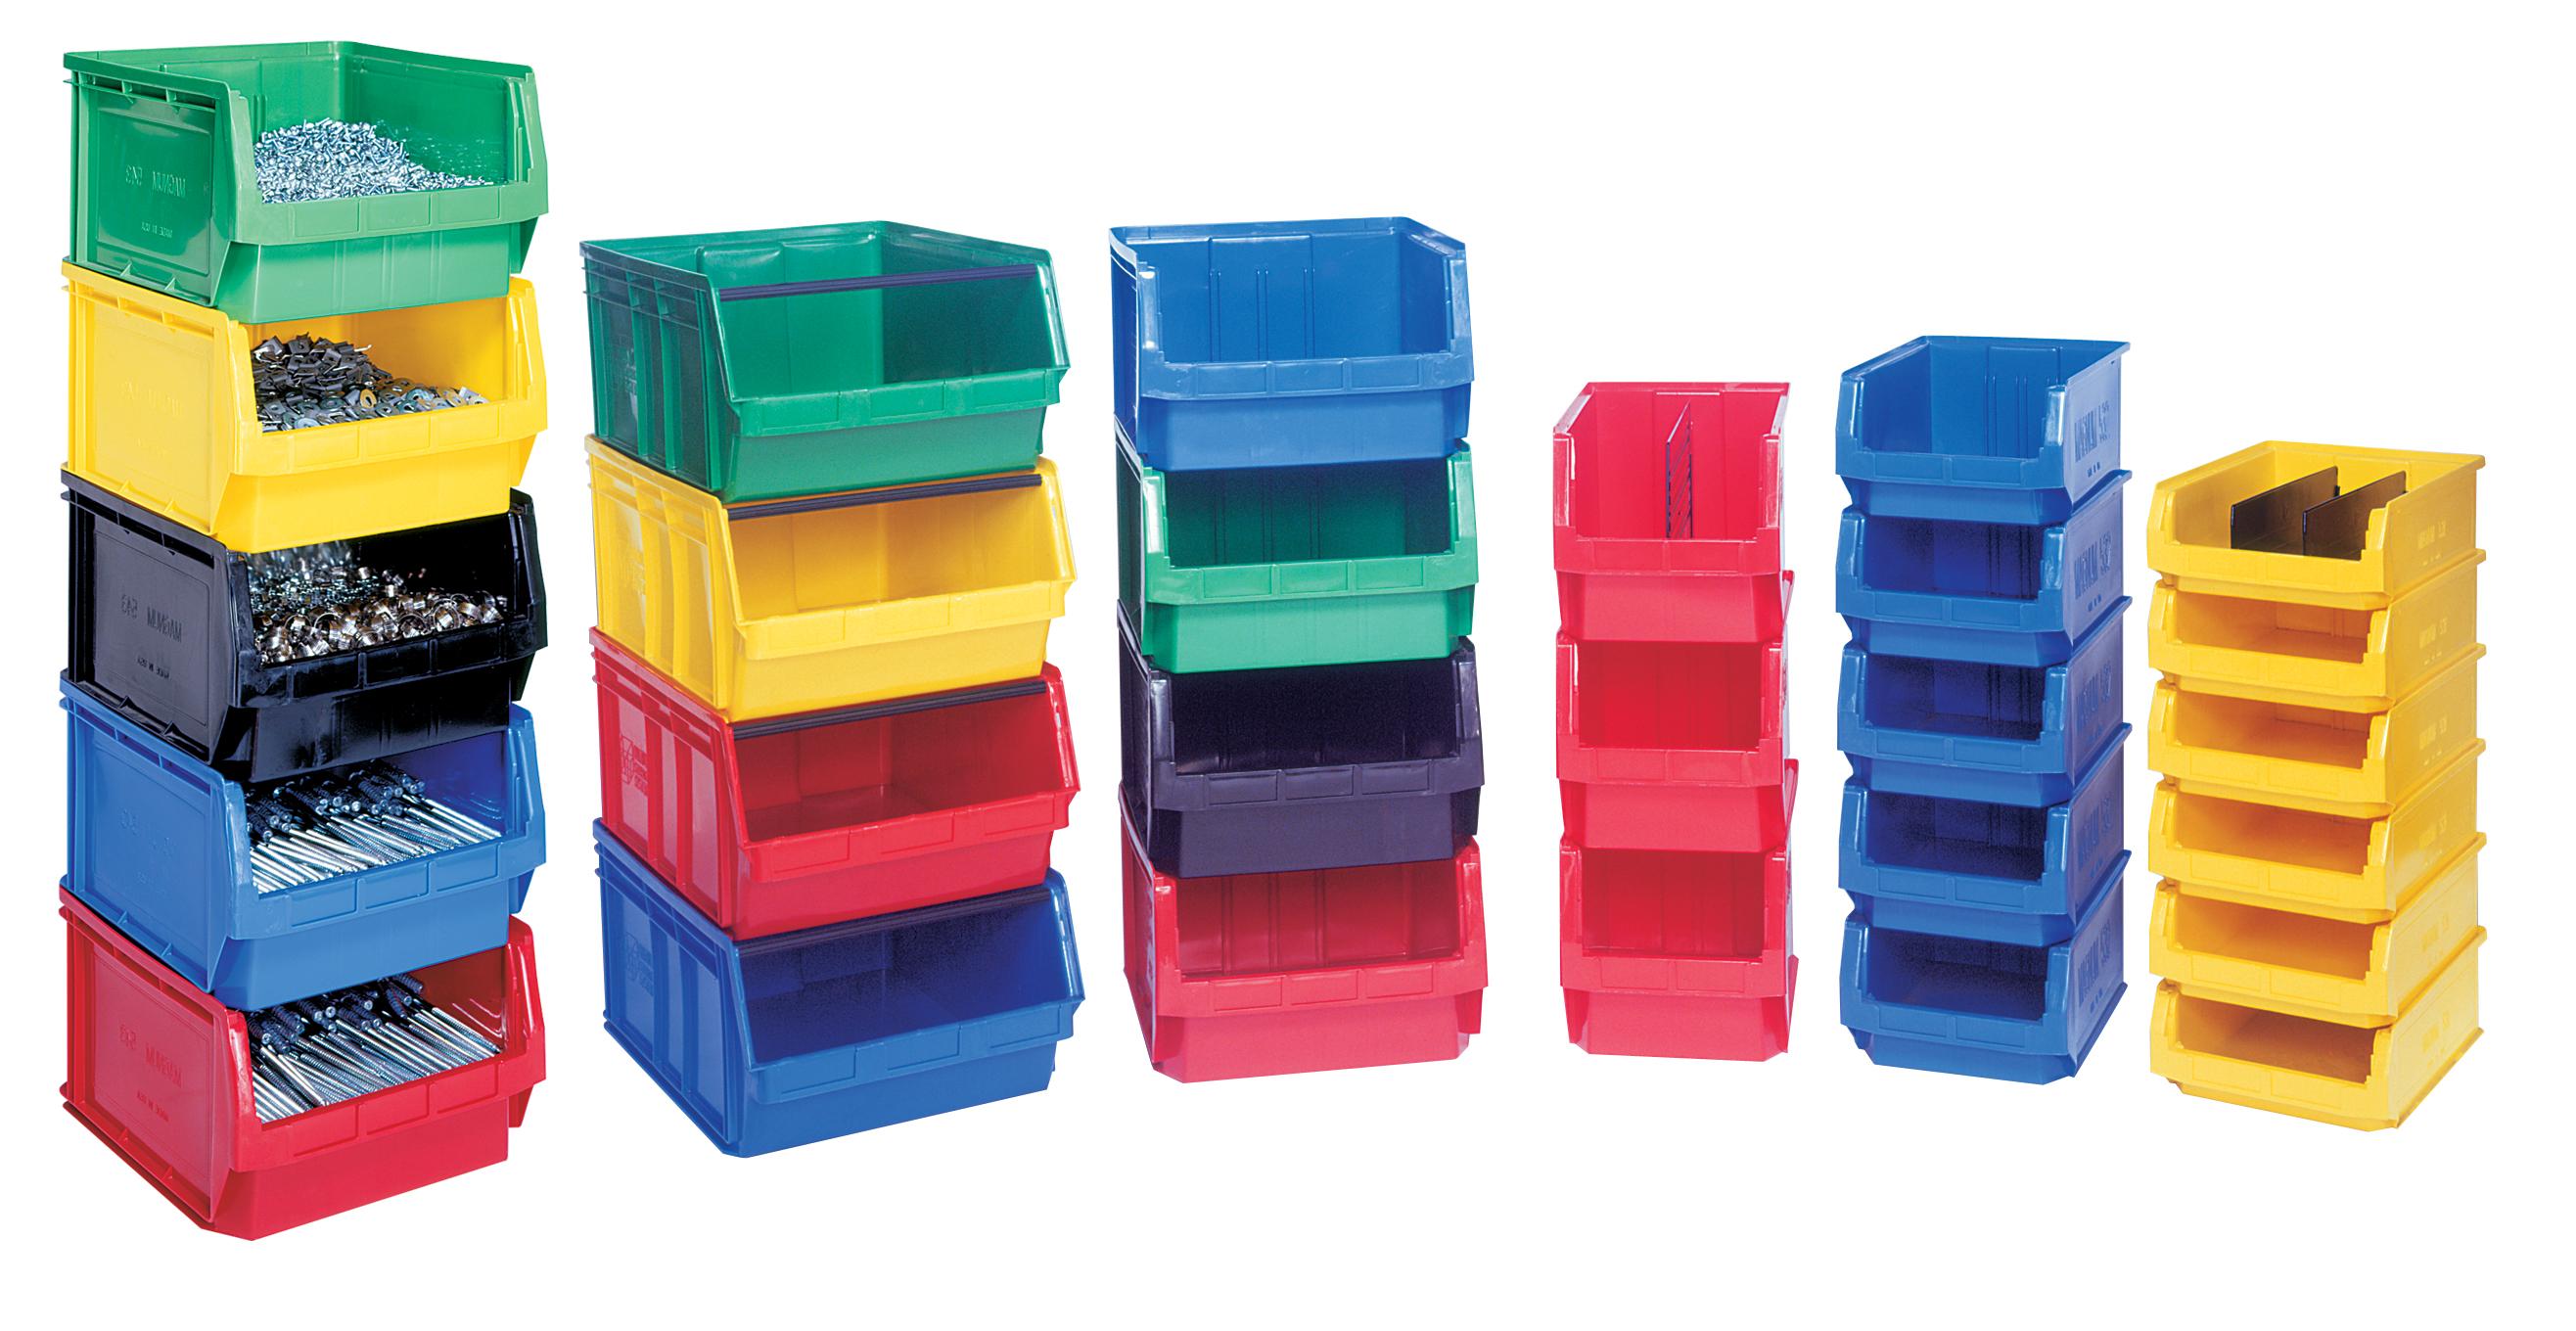 Bins and Bin Storage Systems